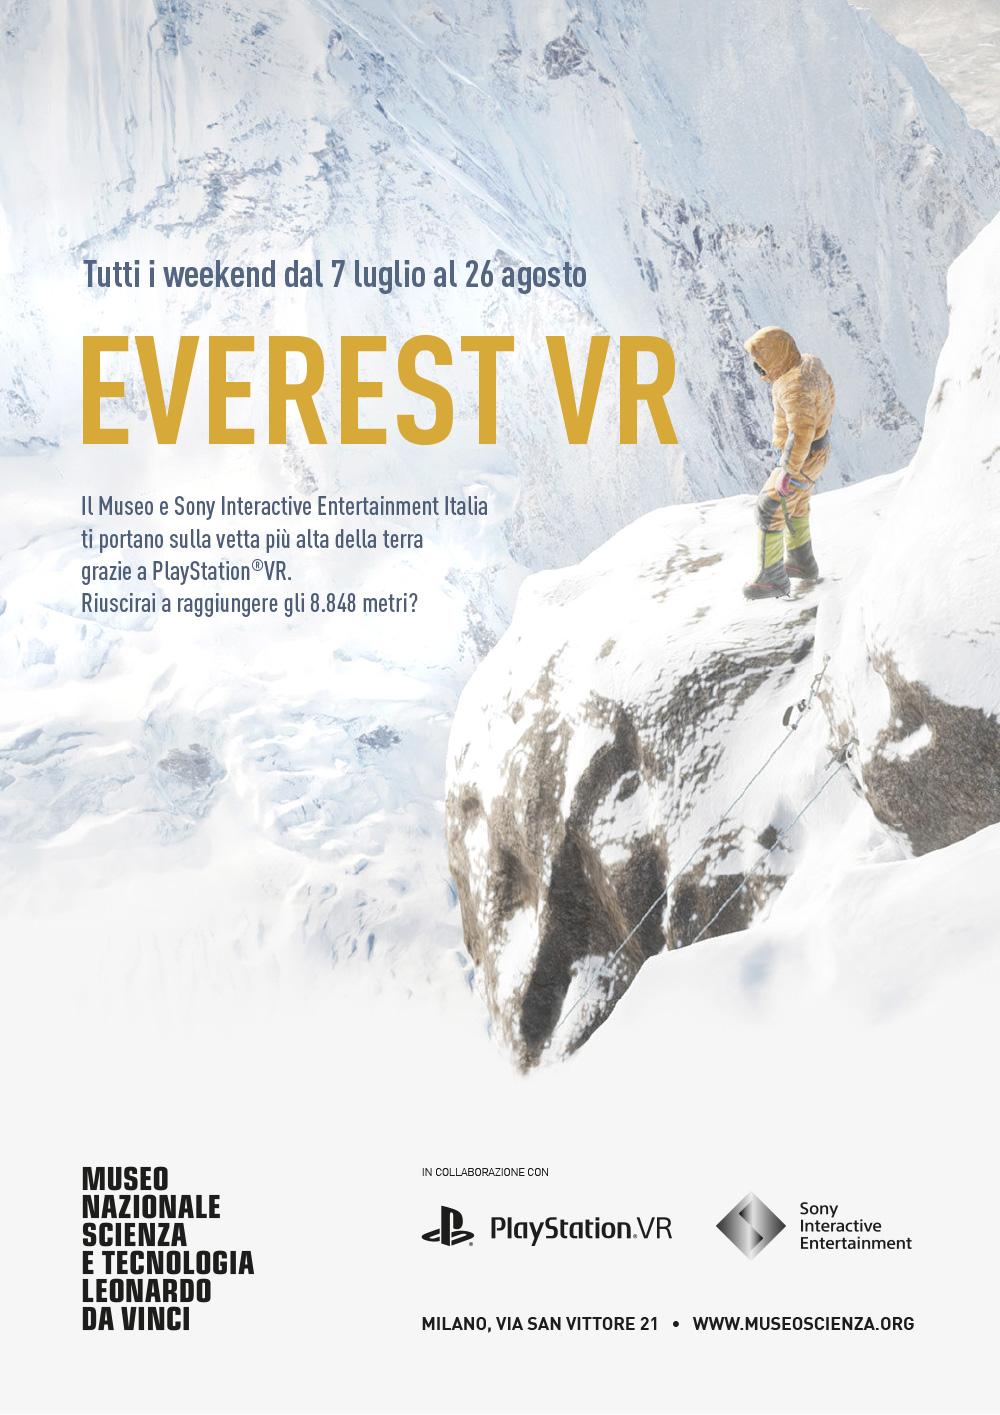 everestvr-1